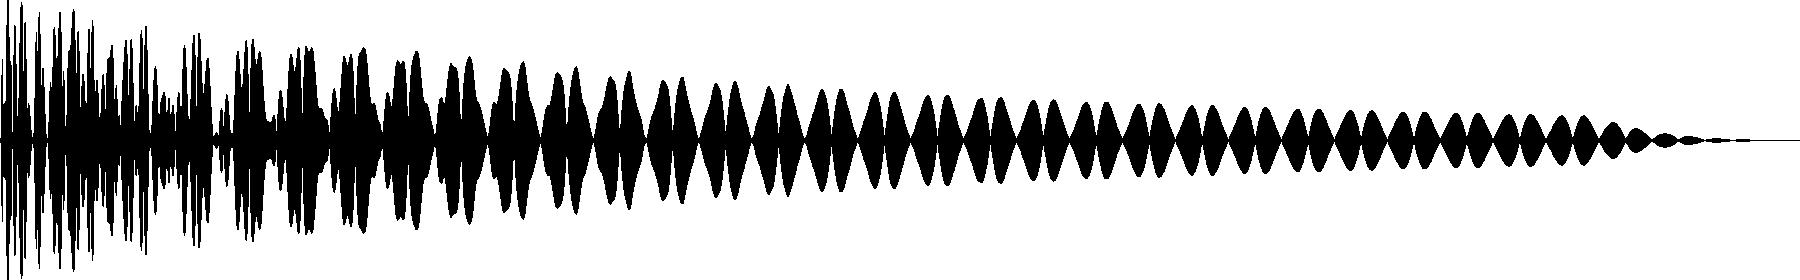 vedh bass cut 008 g